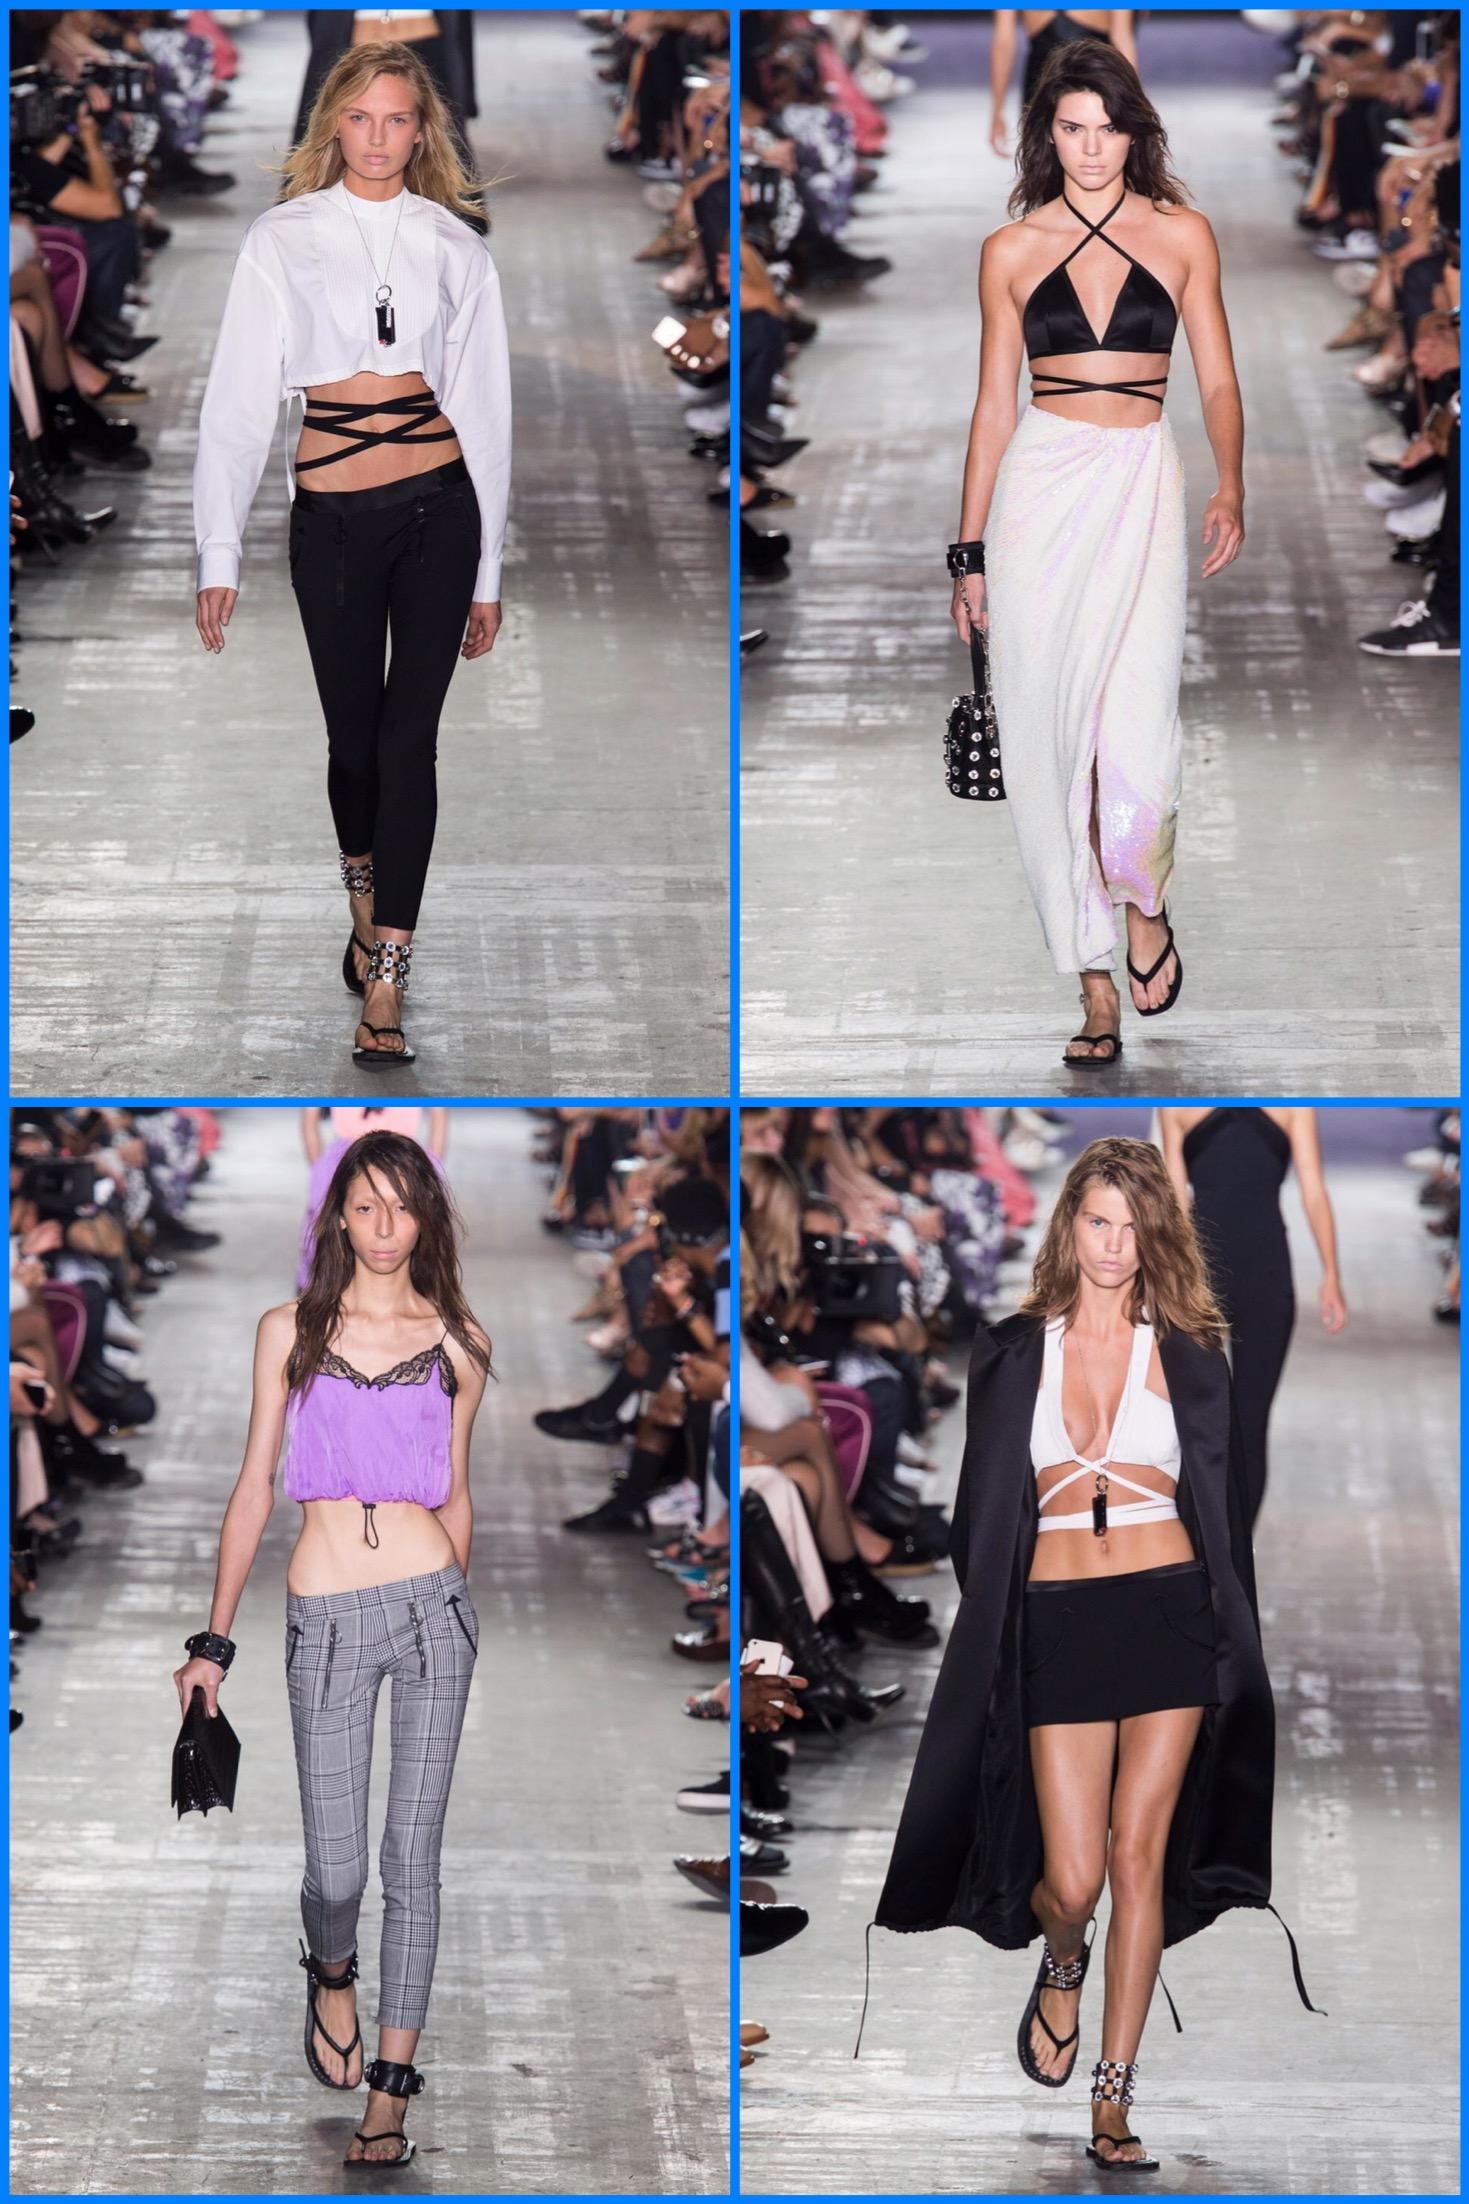 new-york-fashion-week-pret-a-porter-spring-summer-2017-style-alexander-wang